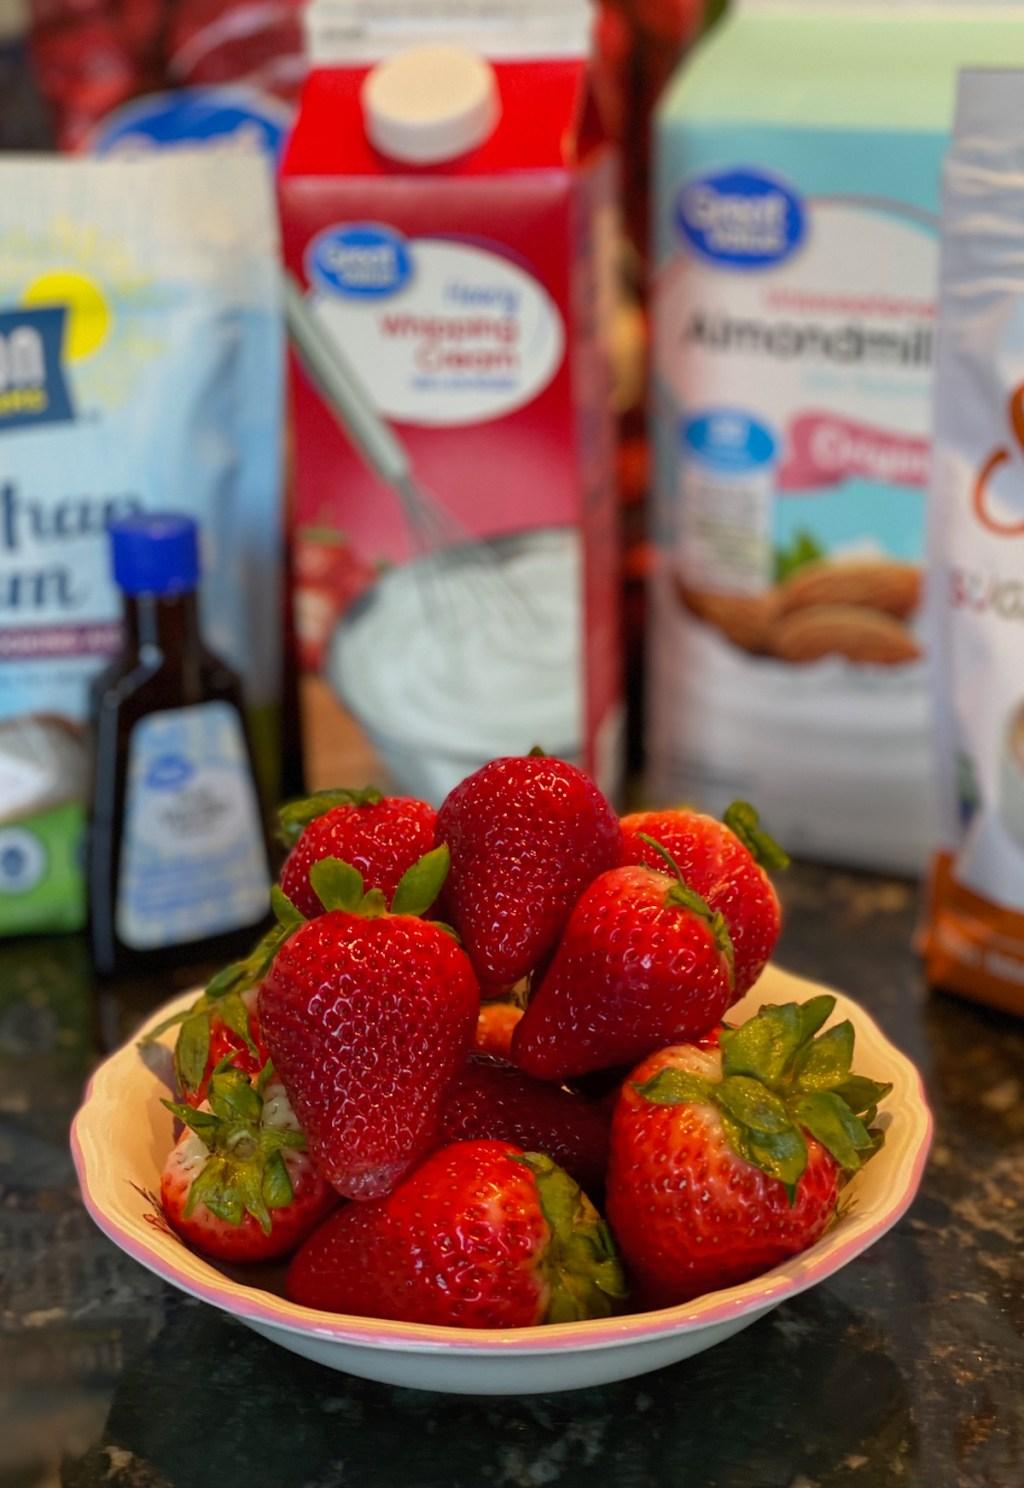 ingredients for keto strawberry milkshake on counter